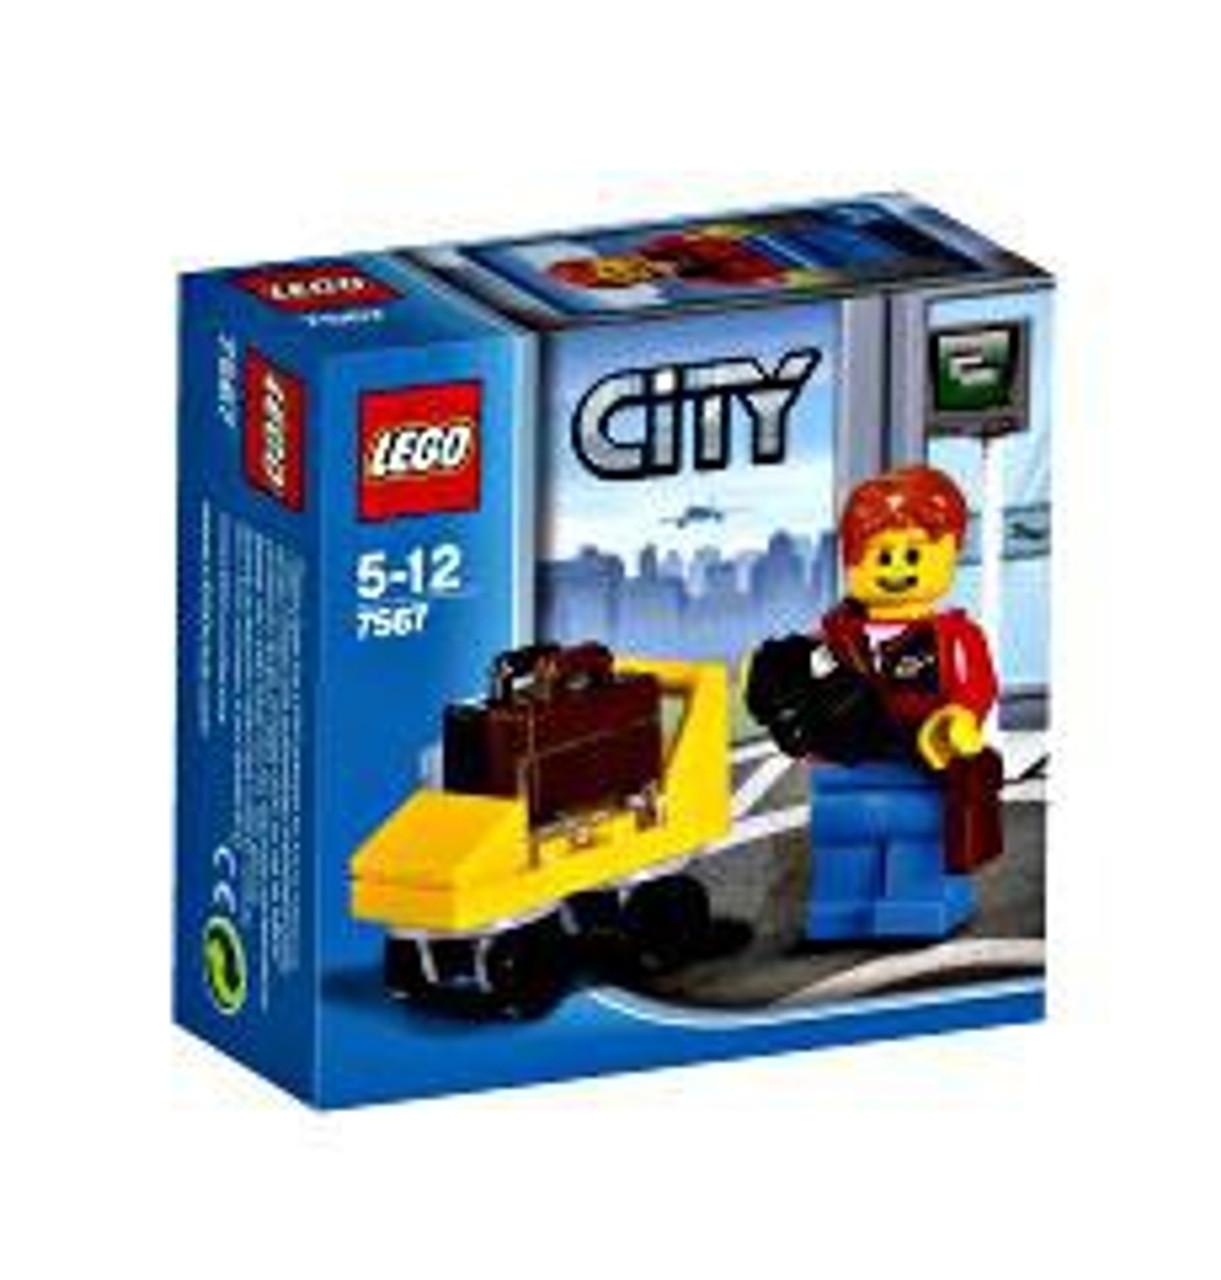 LEGO City Traveler Set #7567